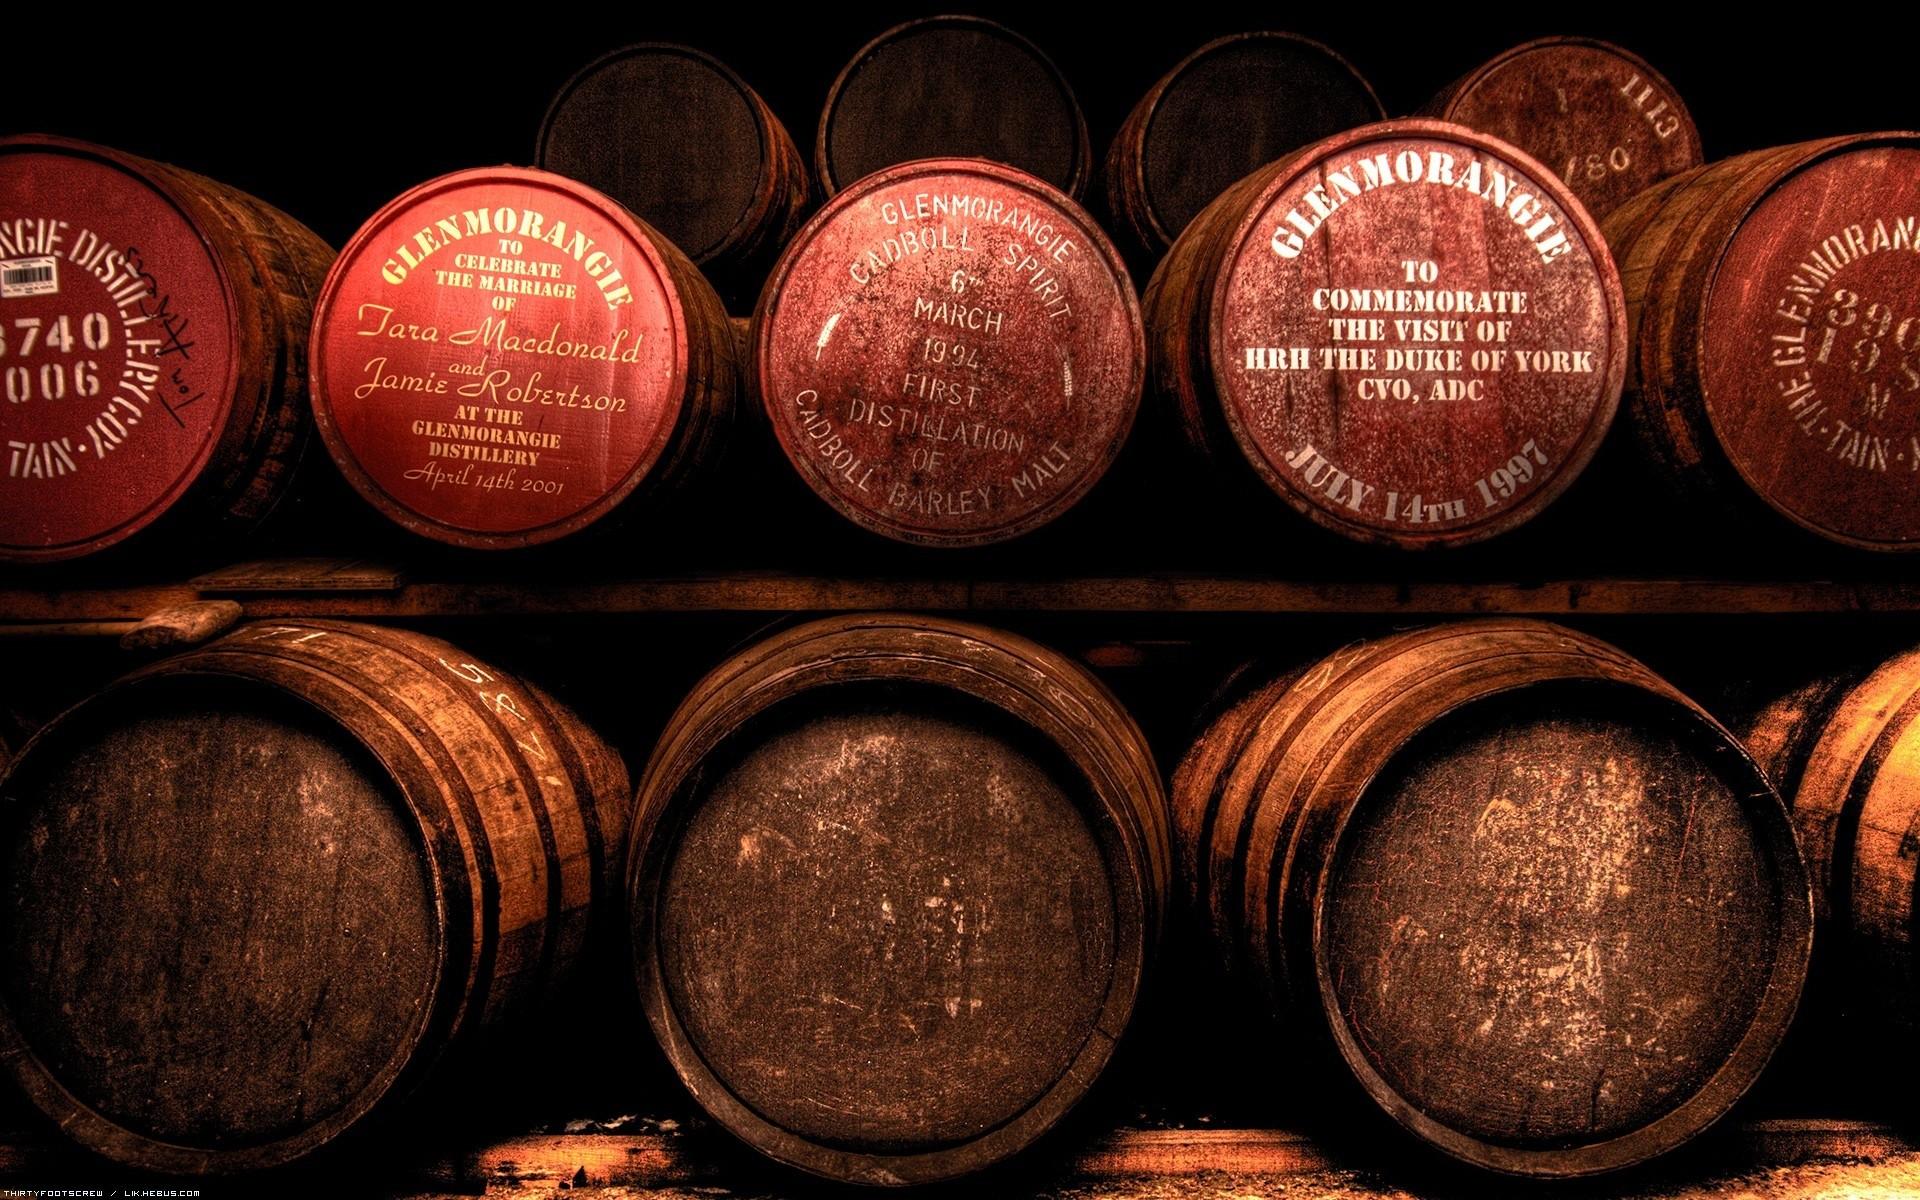 Image: Whisky HD wallpaper 0005 – Album: Whisky: Wallpaper, wallpapers .